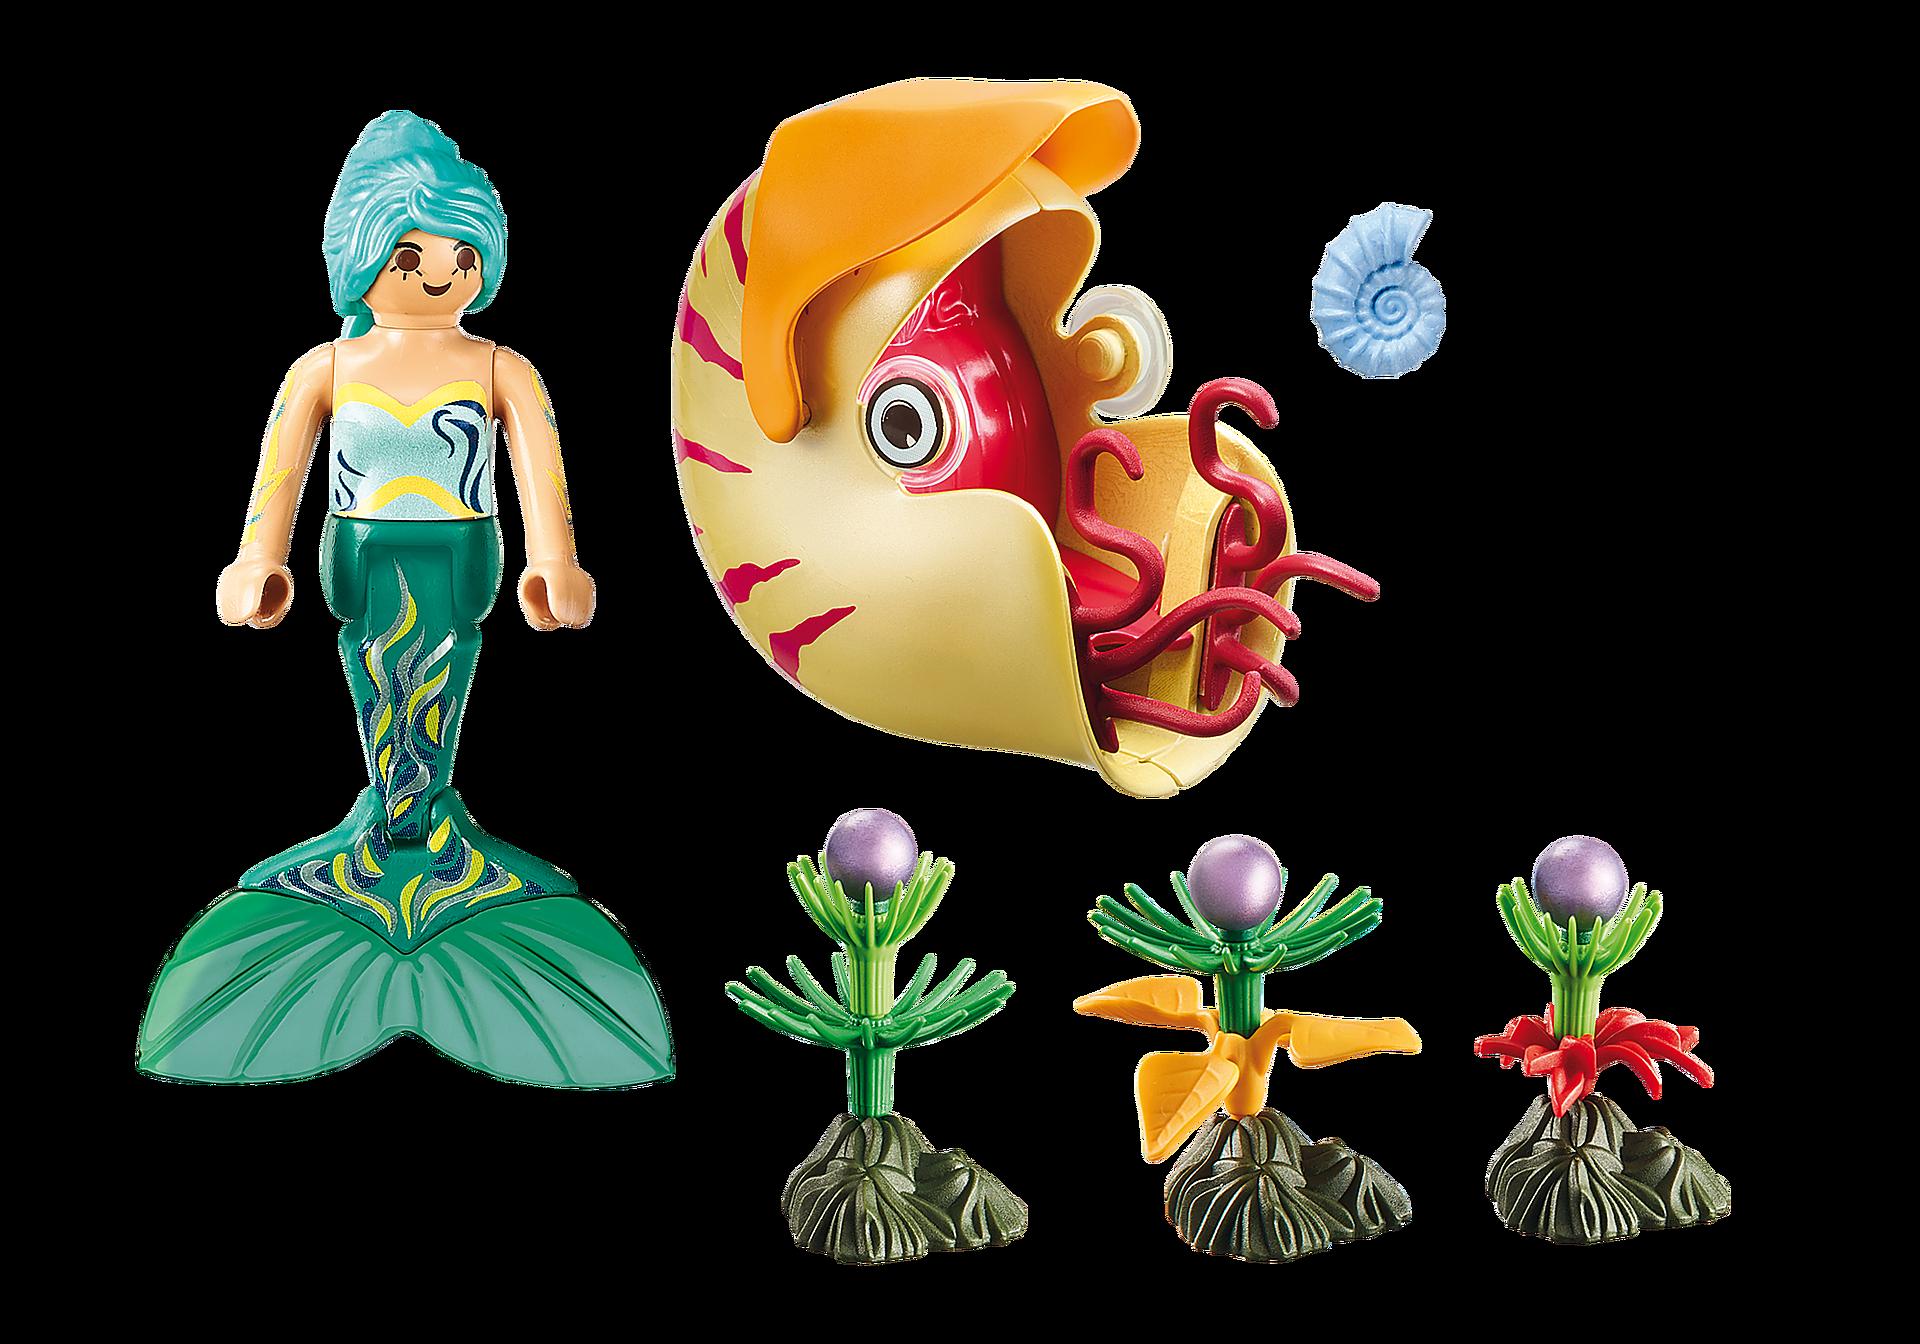 70098 Sirena con carrozza nautilus zoom image3